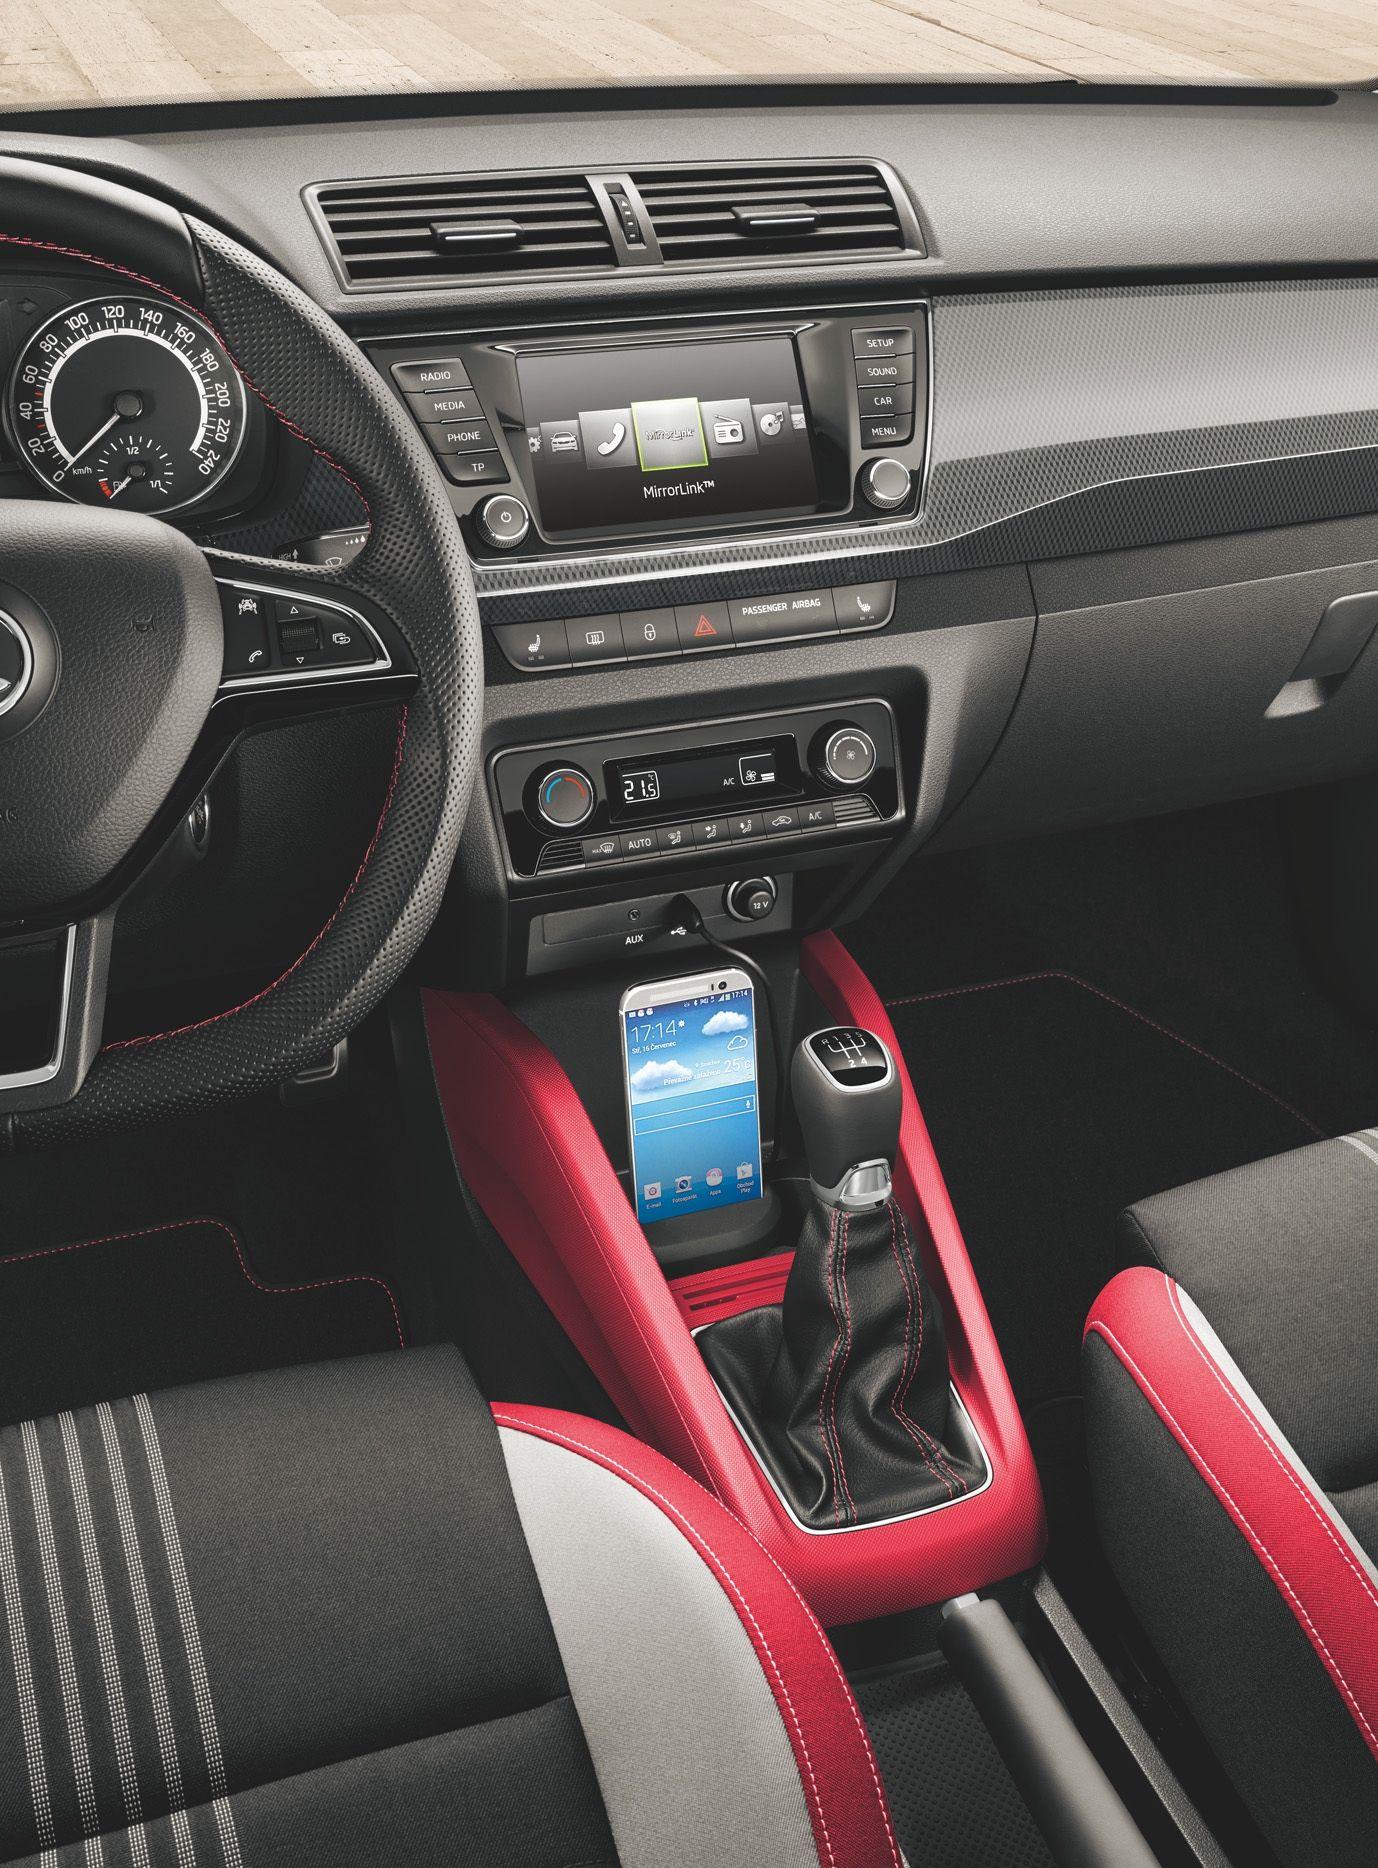 Release date 2016 skoda superb price release skoda yeti 2016 review - 2015 Skoda Fabia Gets New Monte Carlo Edition Carwow